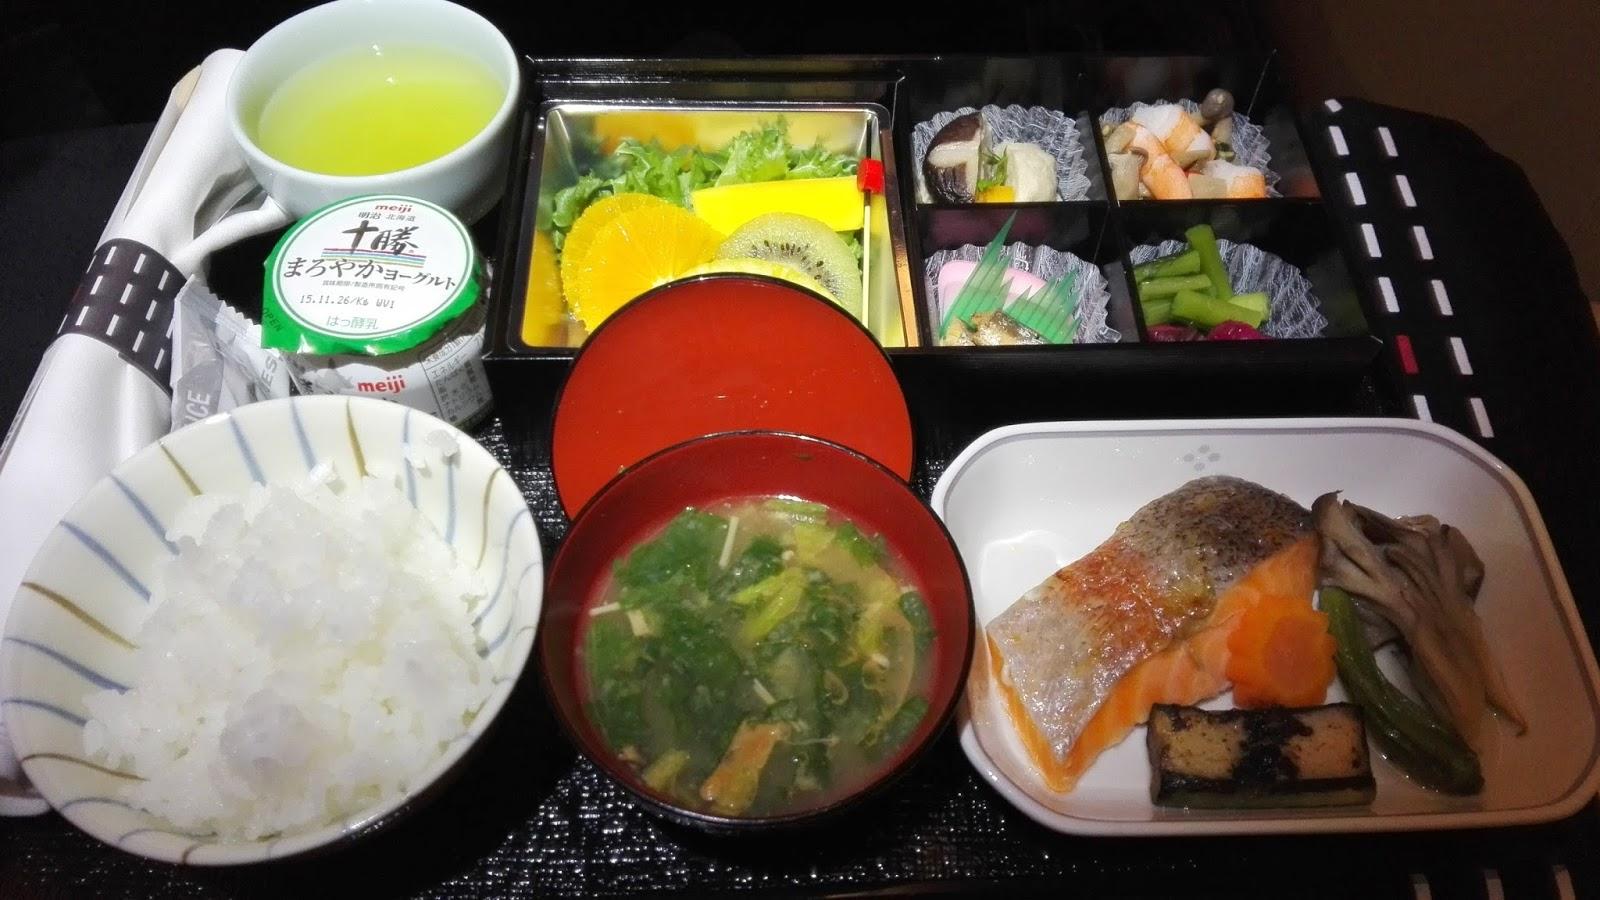 JAL business class Japanese flight meal ビジネスクラス和食